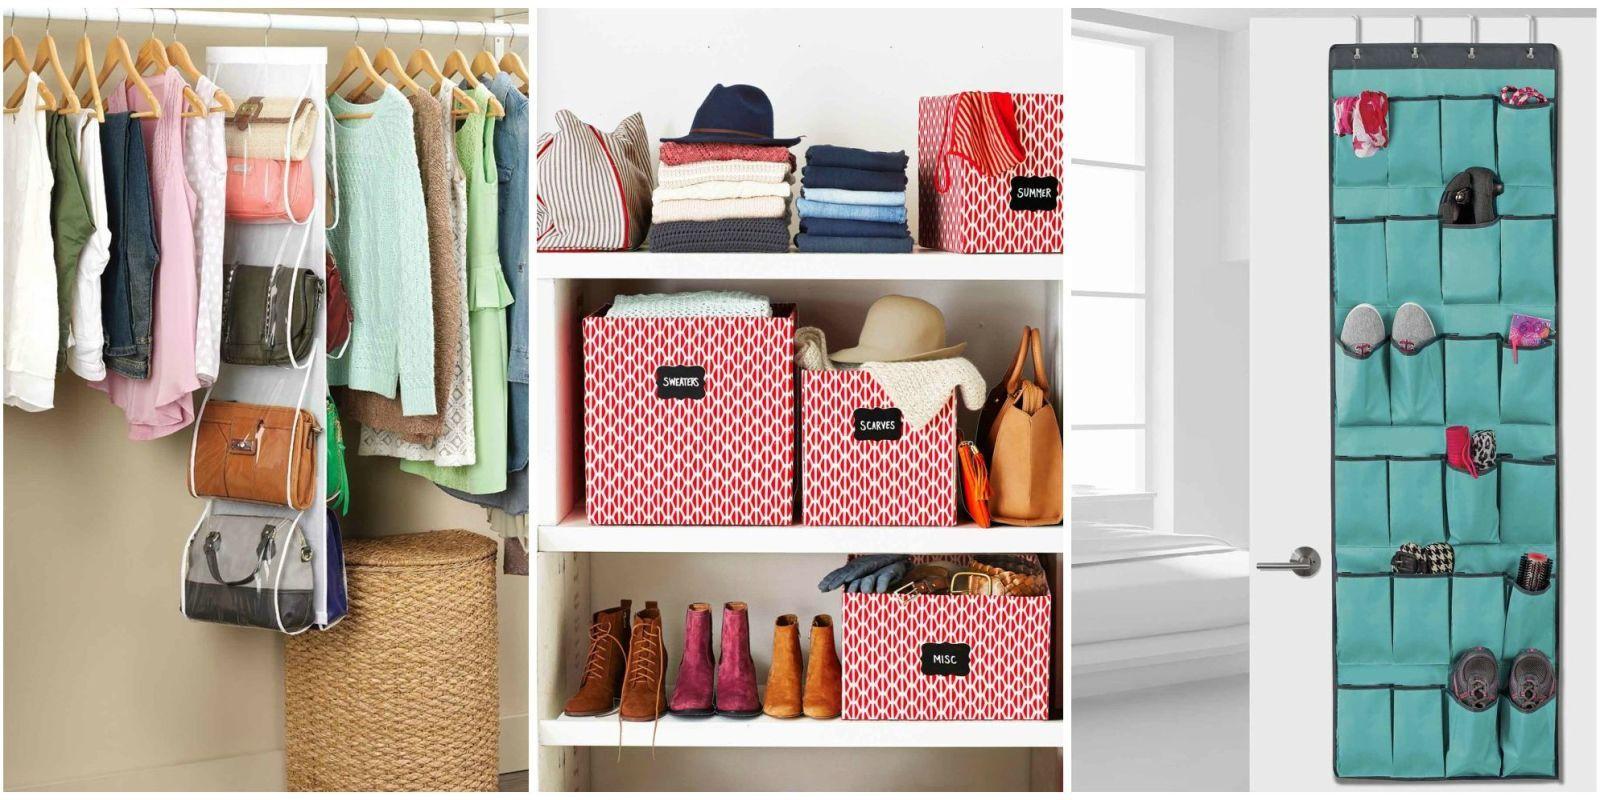 24 Best Closet Organization Storage Ideas How to Organize Your